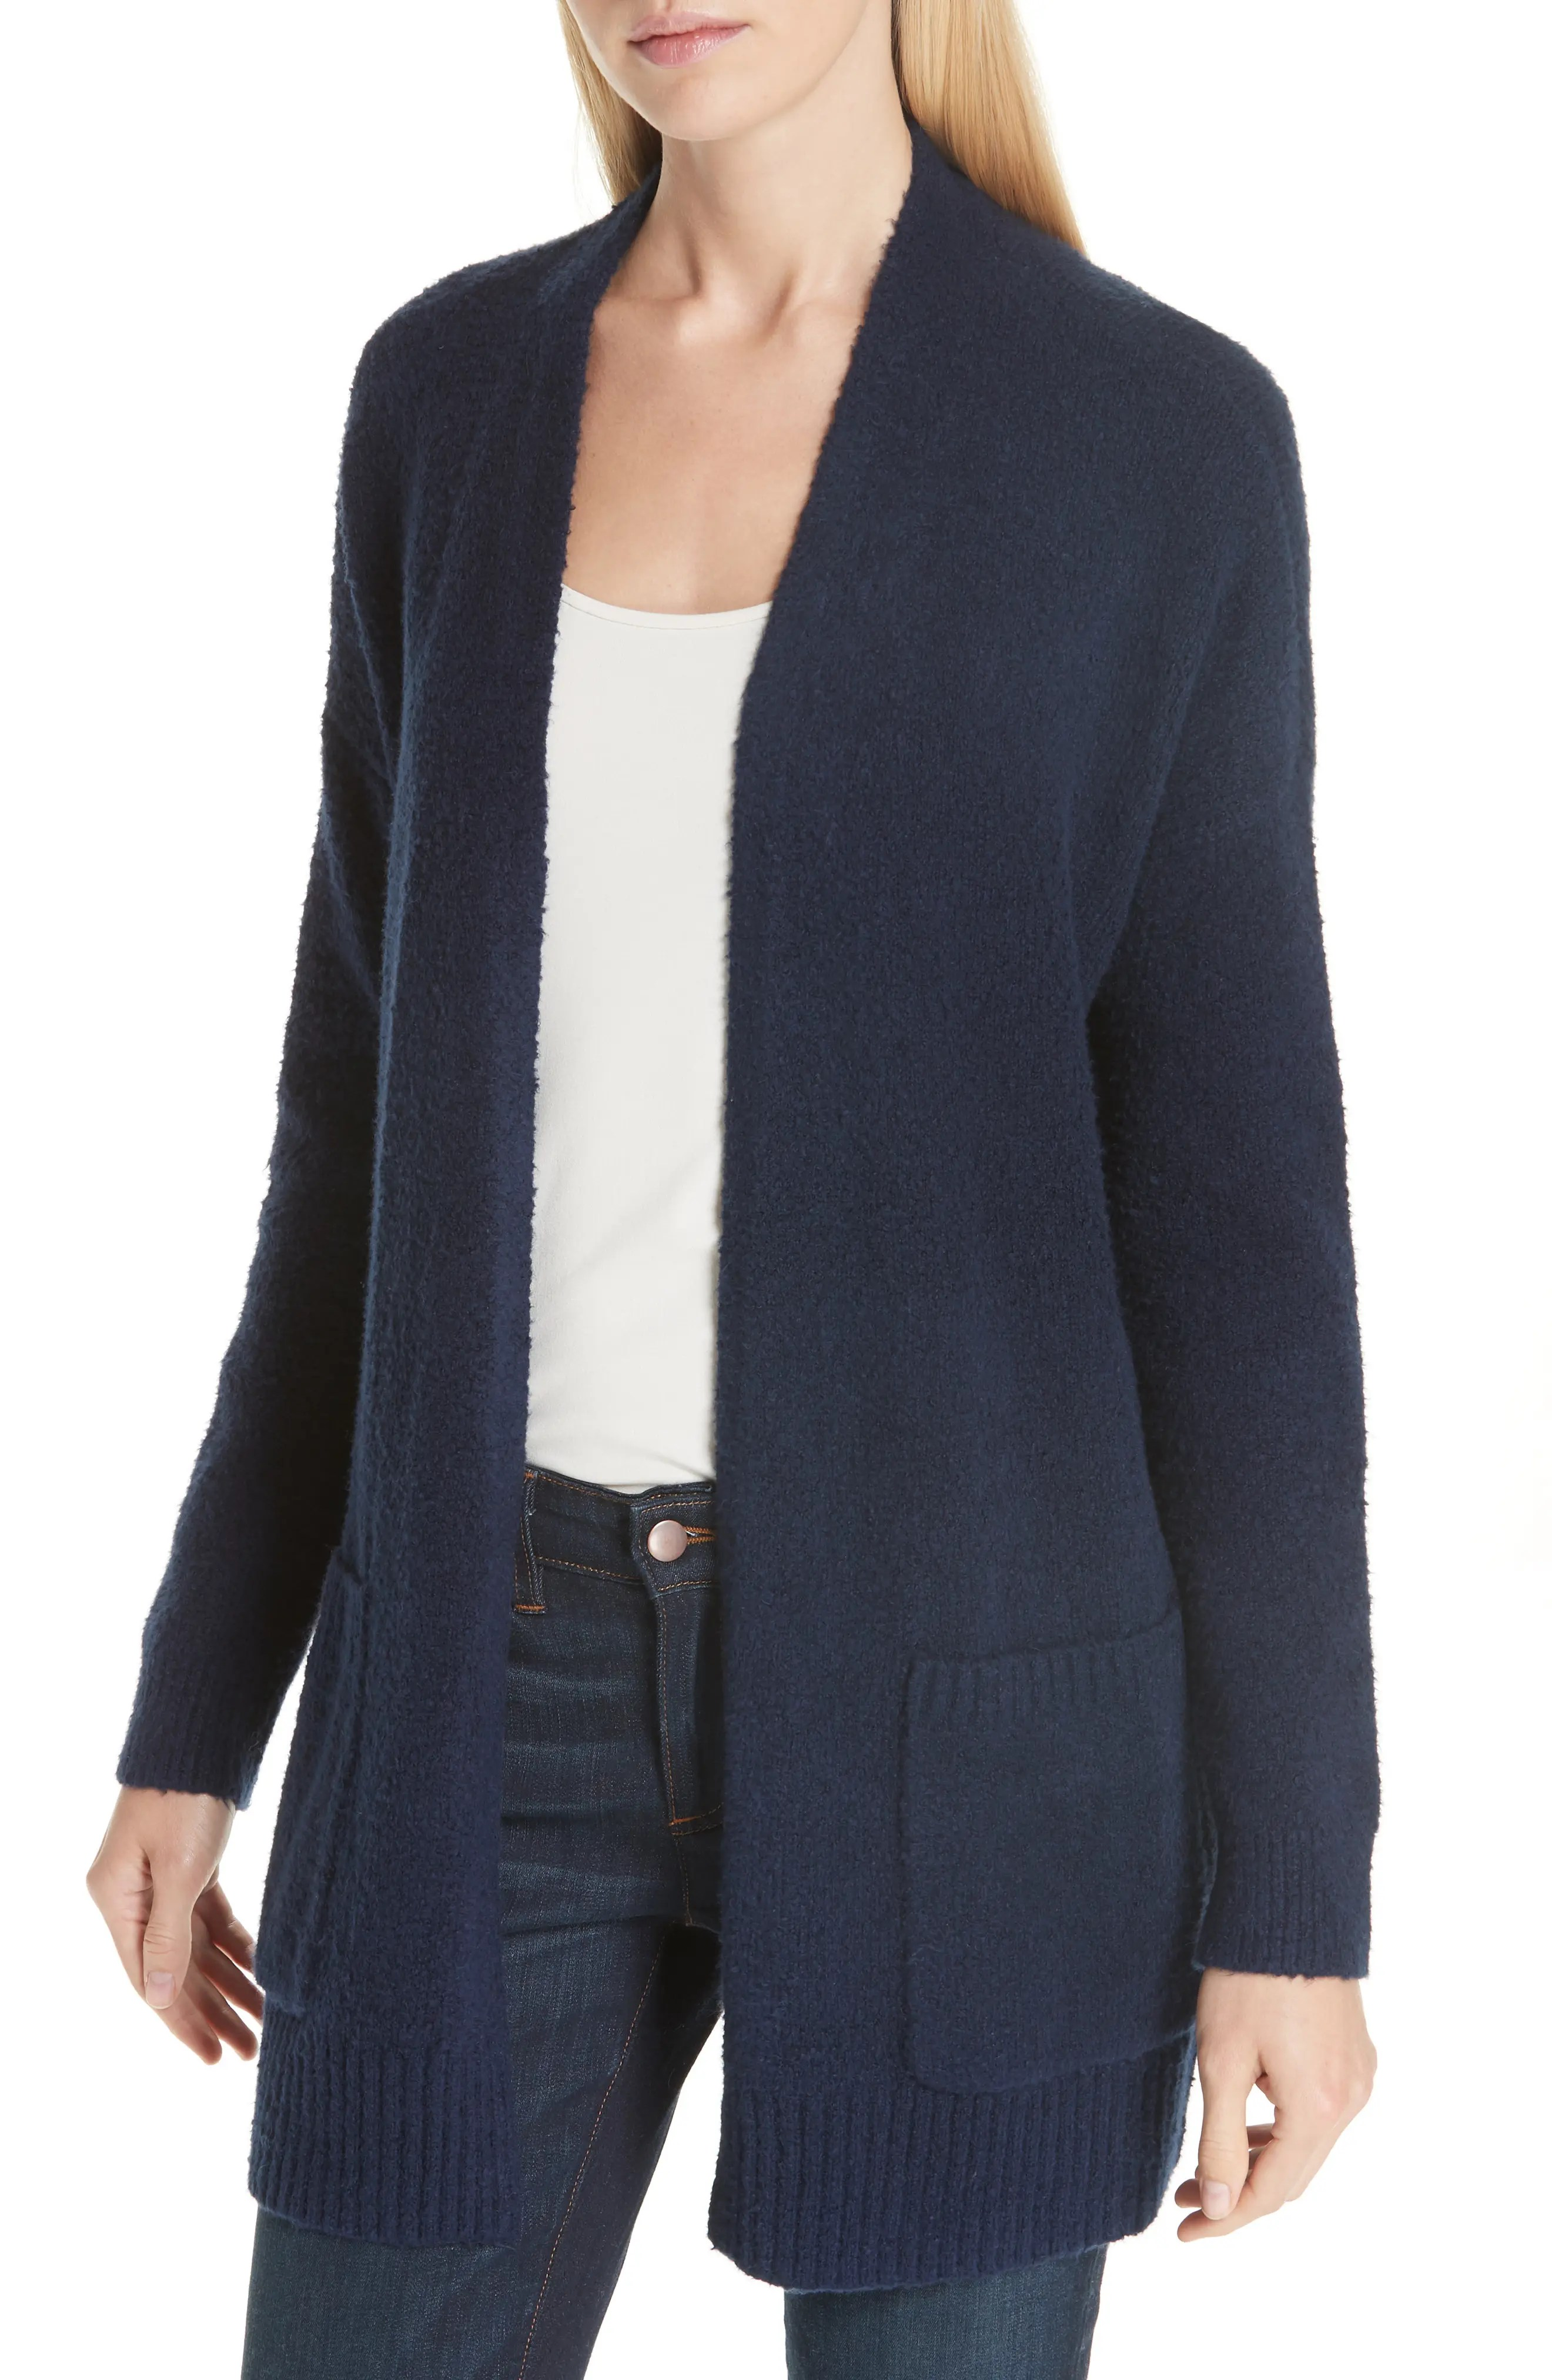 Eileen fisher long organic cotton blend cardigan regular  petite also women  clothing nordstrom rh shoprdstrom